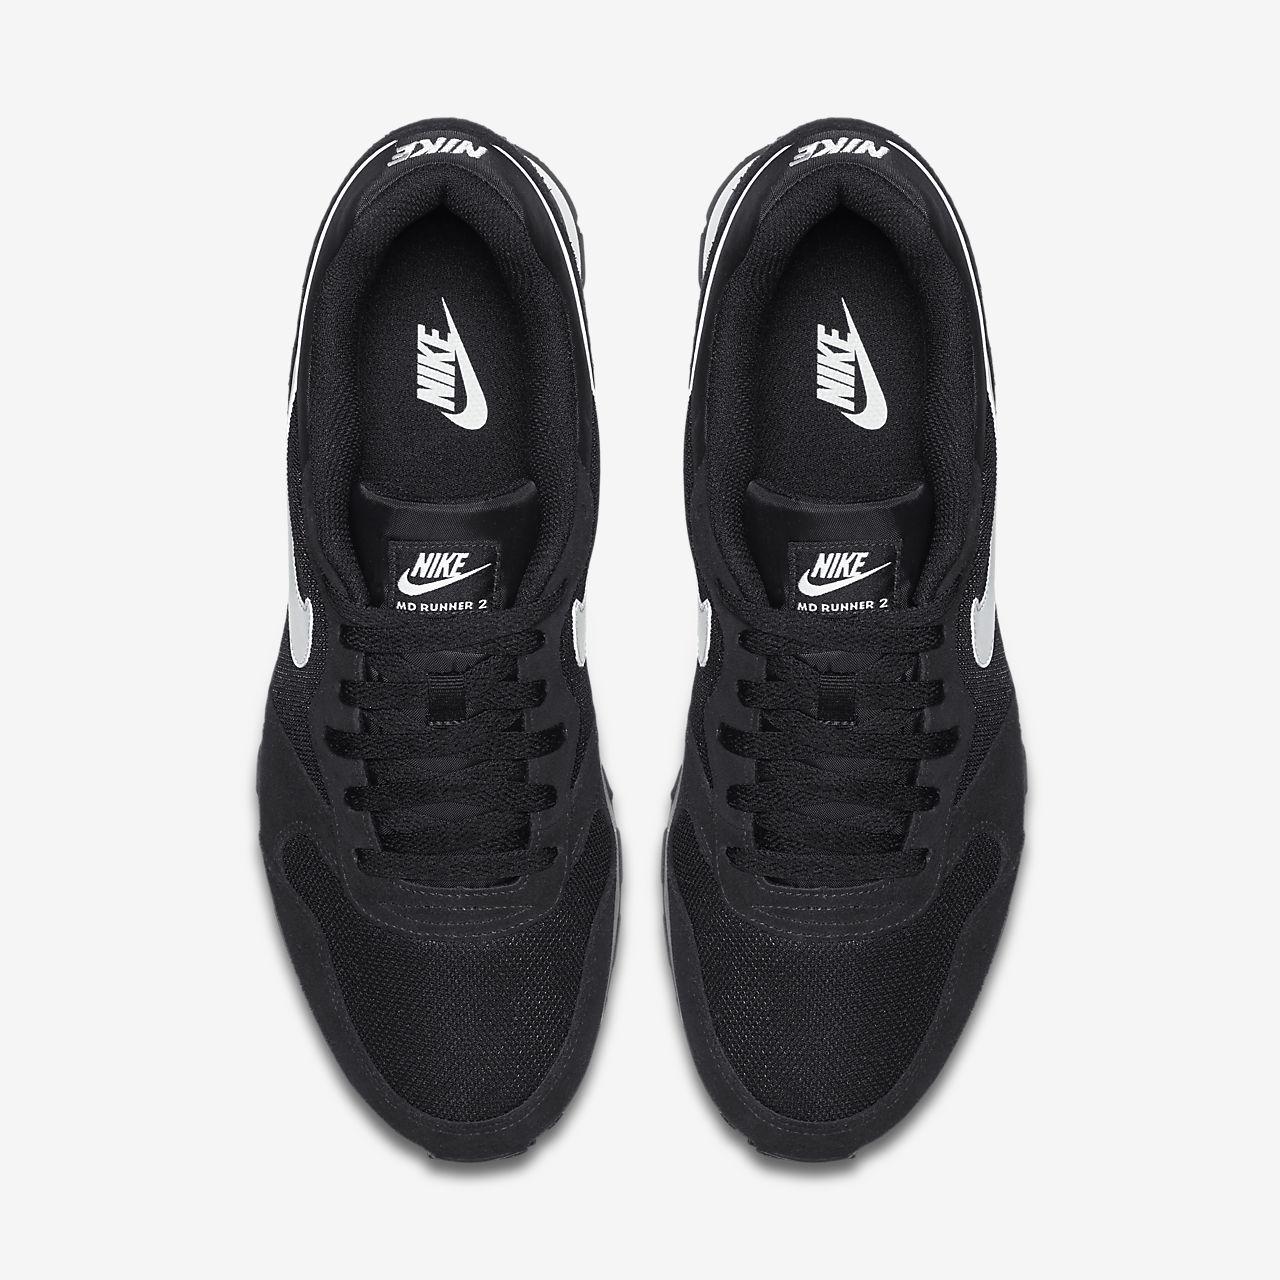 ba038aa27ef68 Nike MD Runner 2 Men s Shoe. Nike.com GB